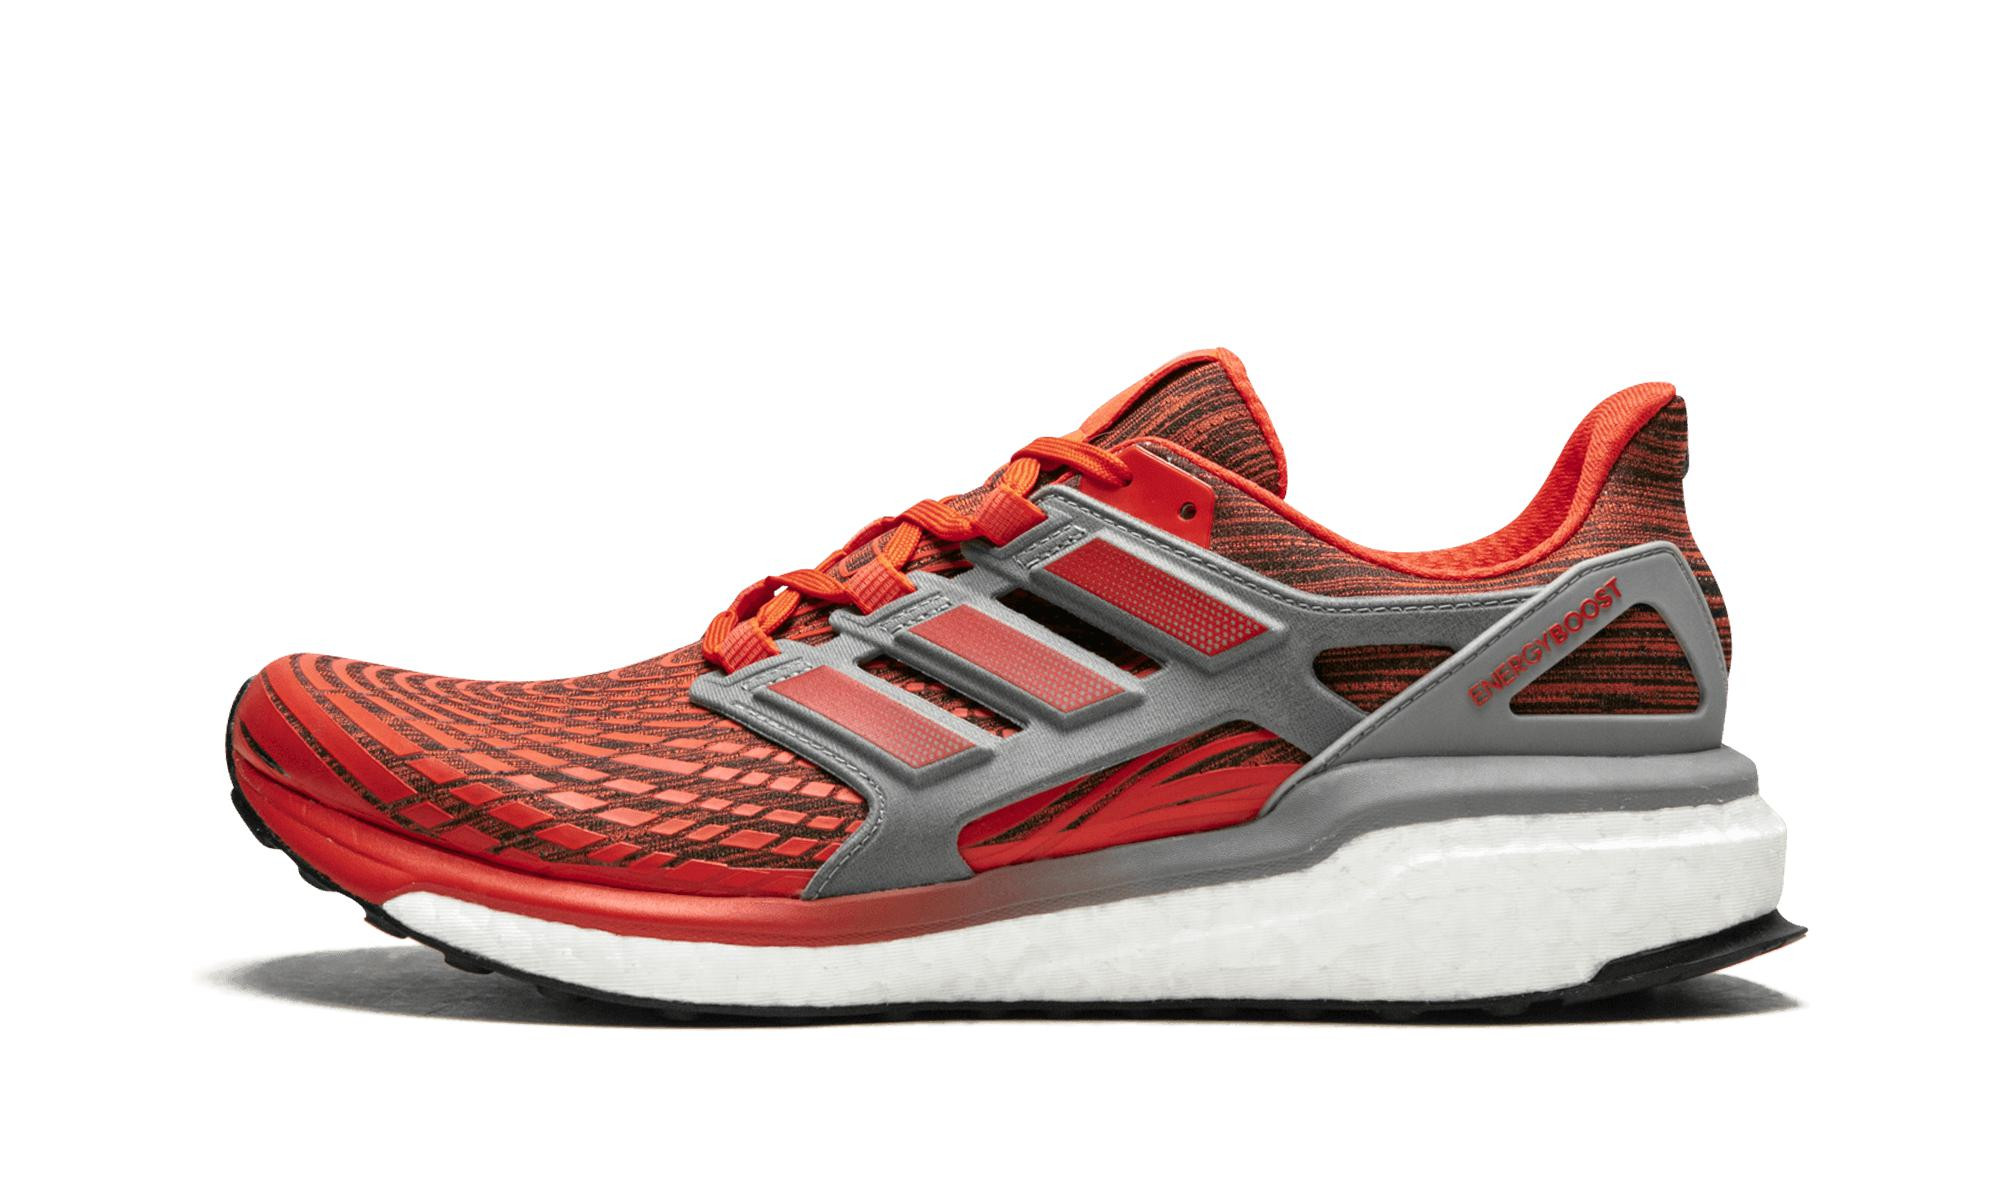 regard détaillé 3a1d3 9913a adidas Energy Boost M in Red for Men - Lyst